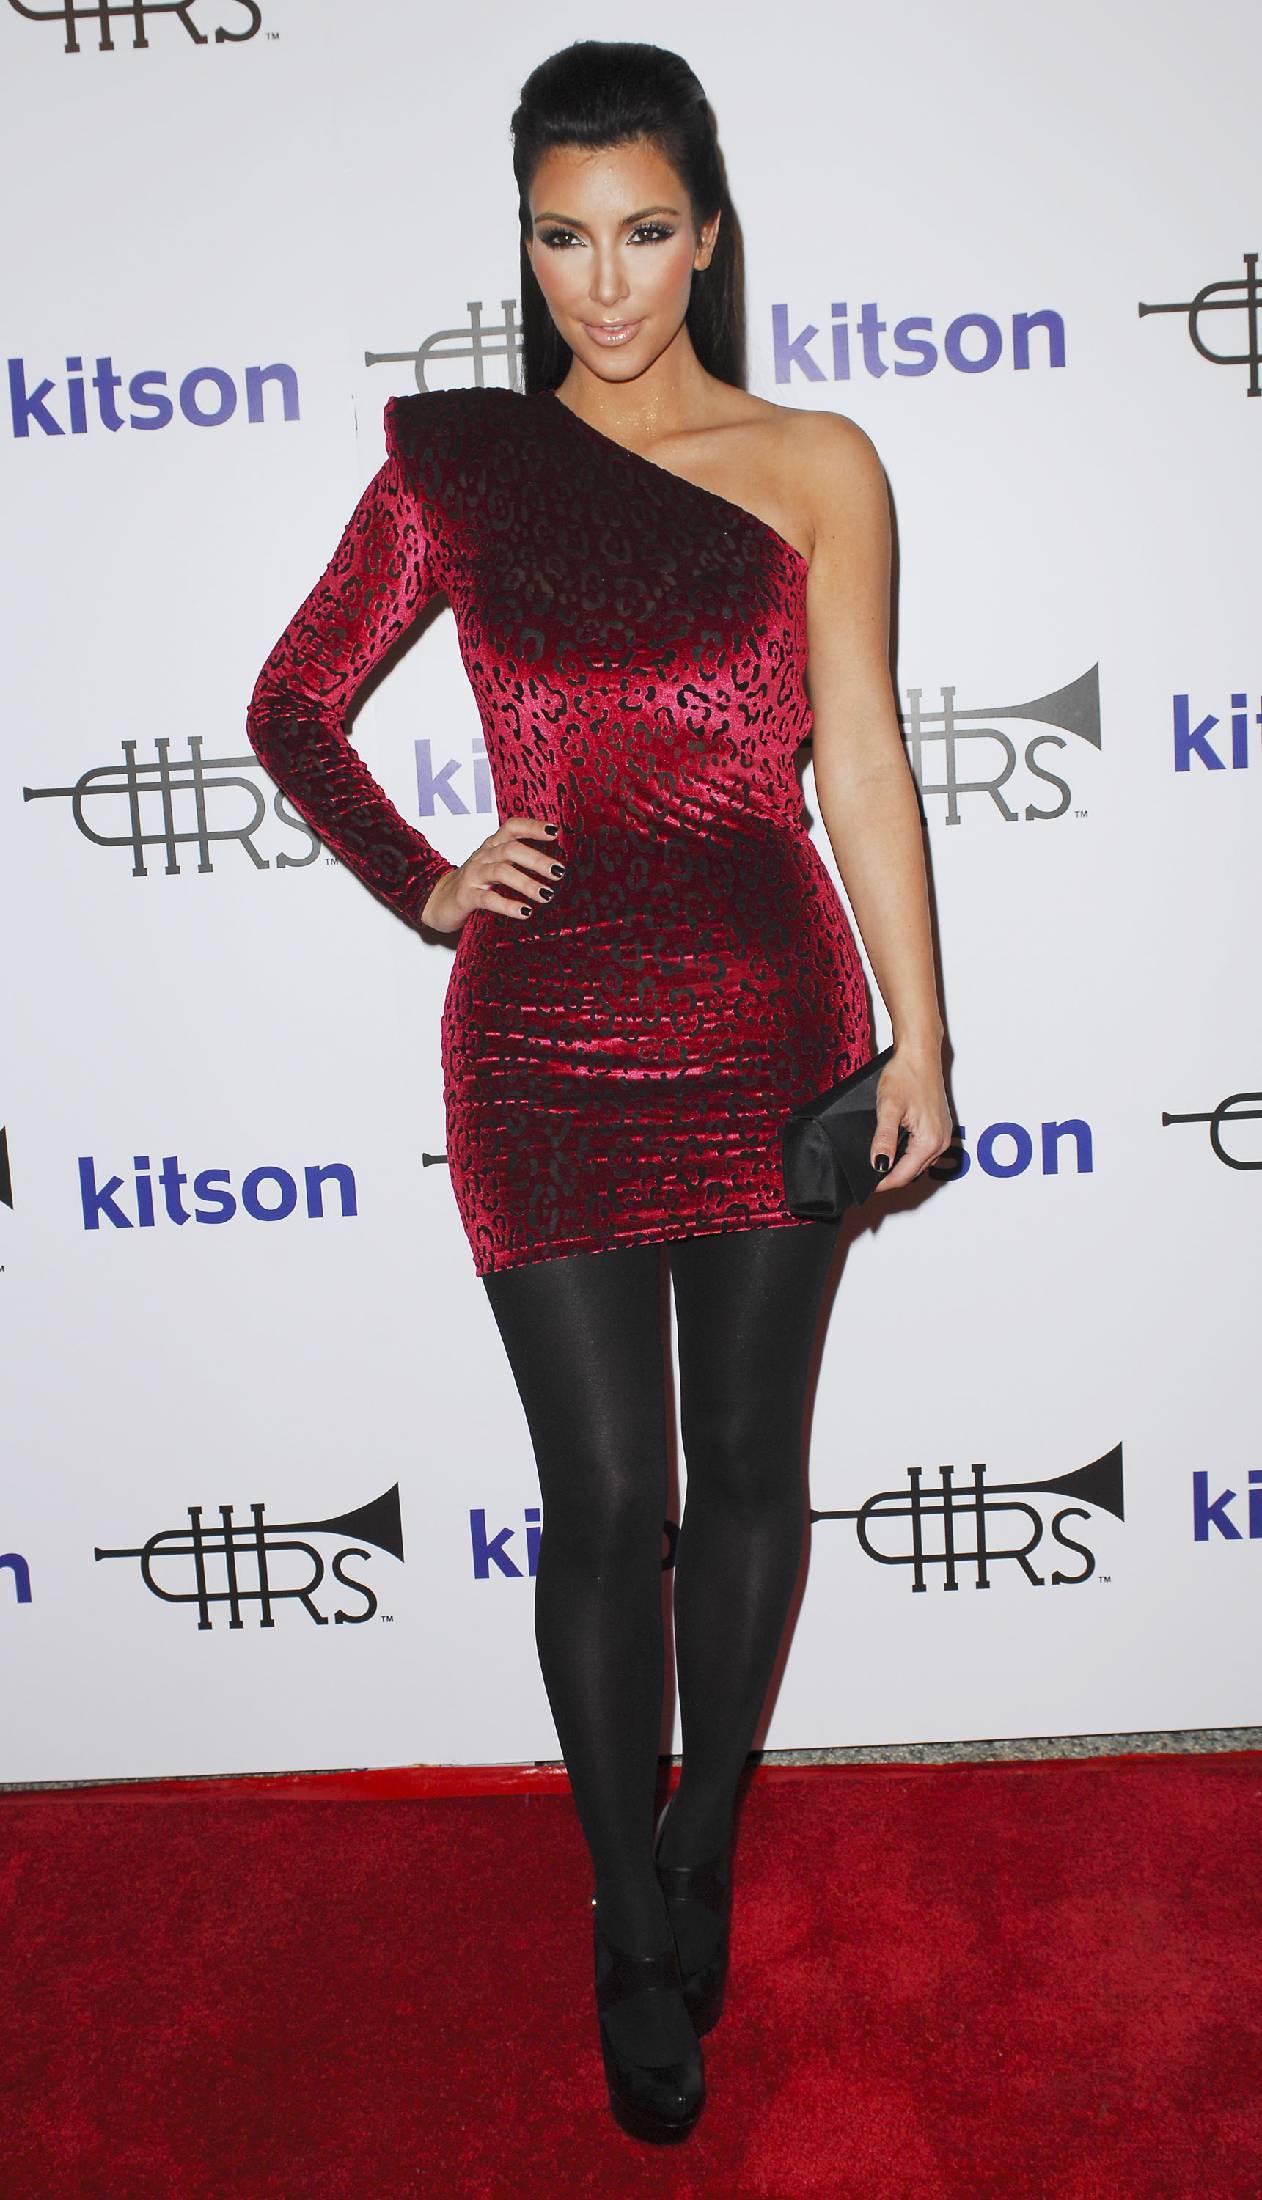 44975_Kim_Kardashian_03_122_71lo.jpg